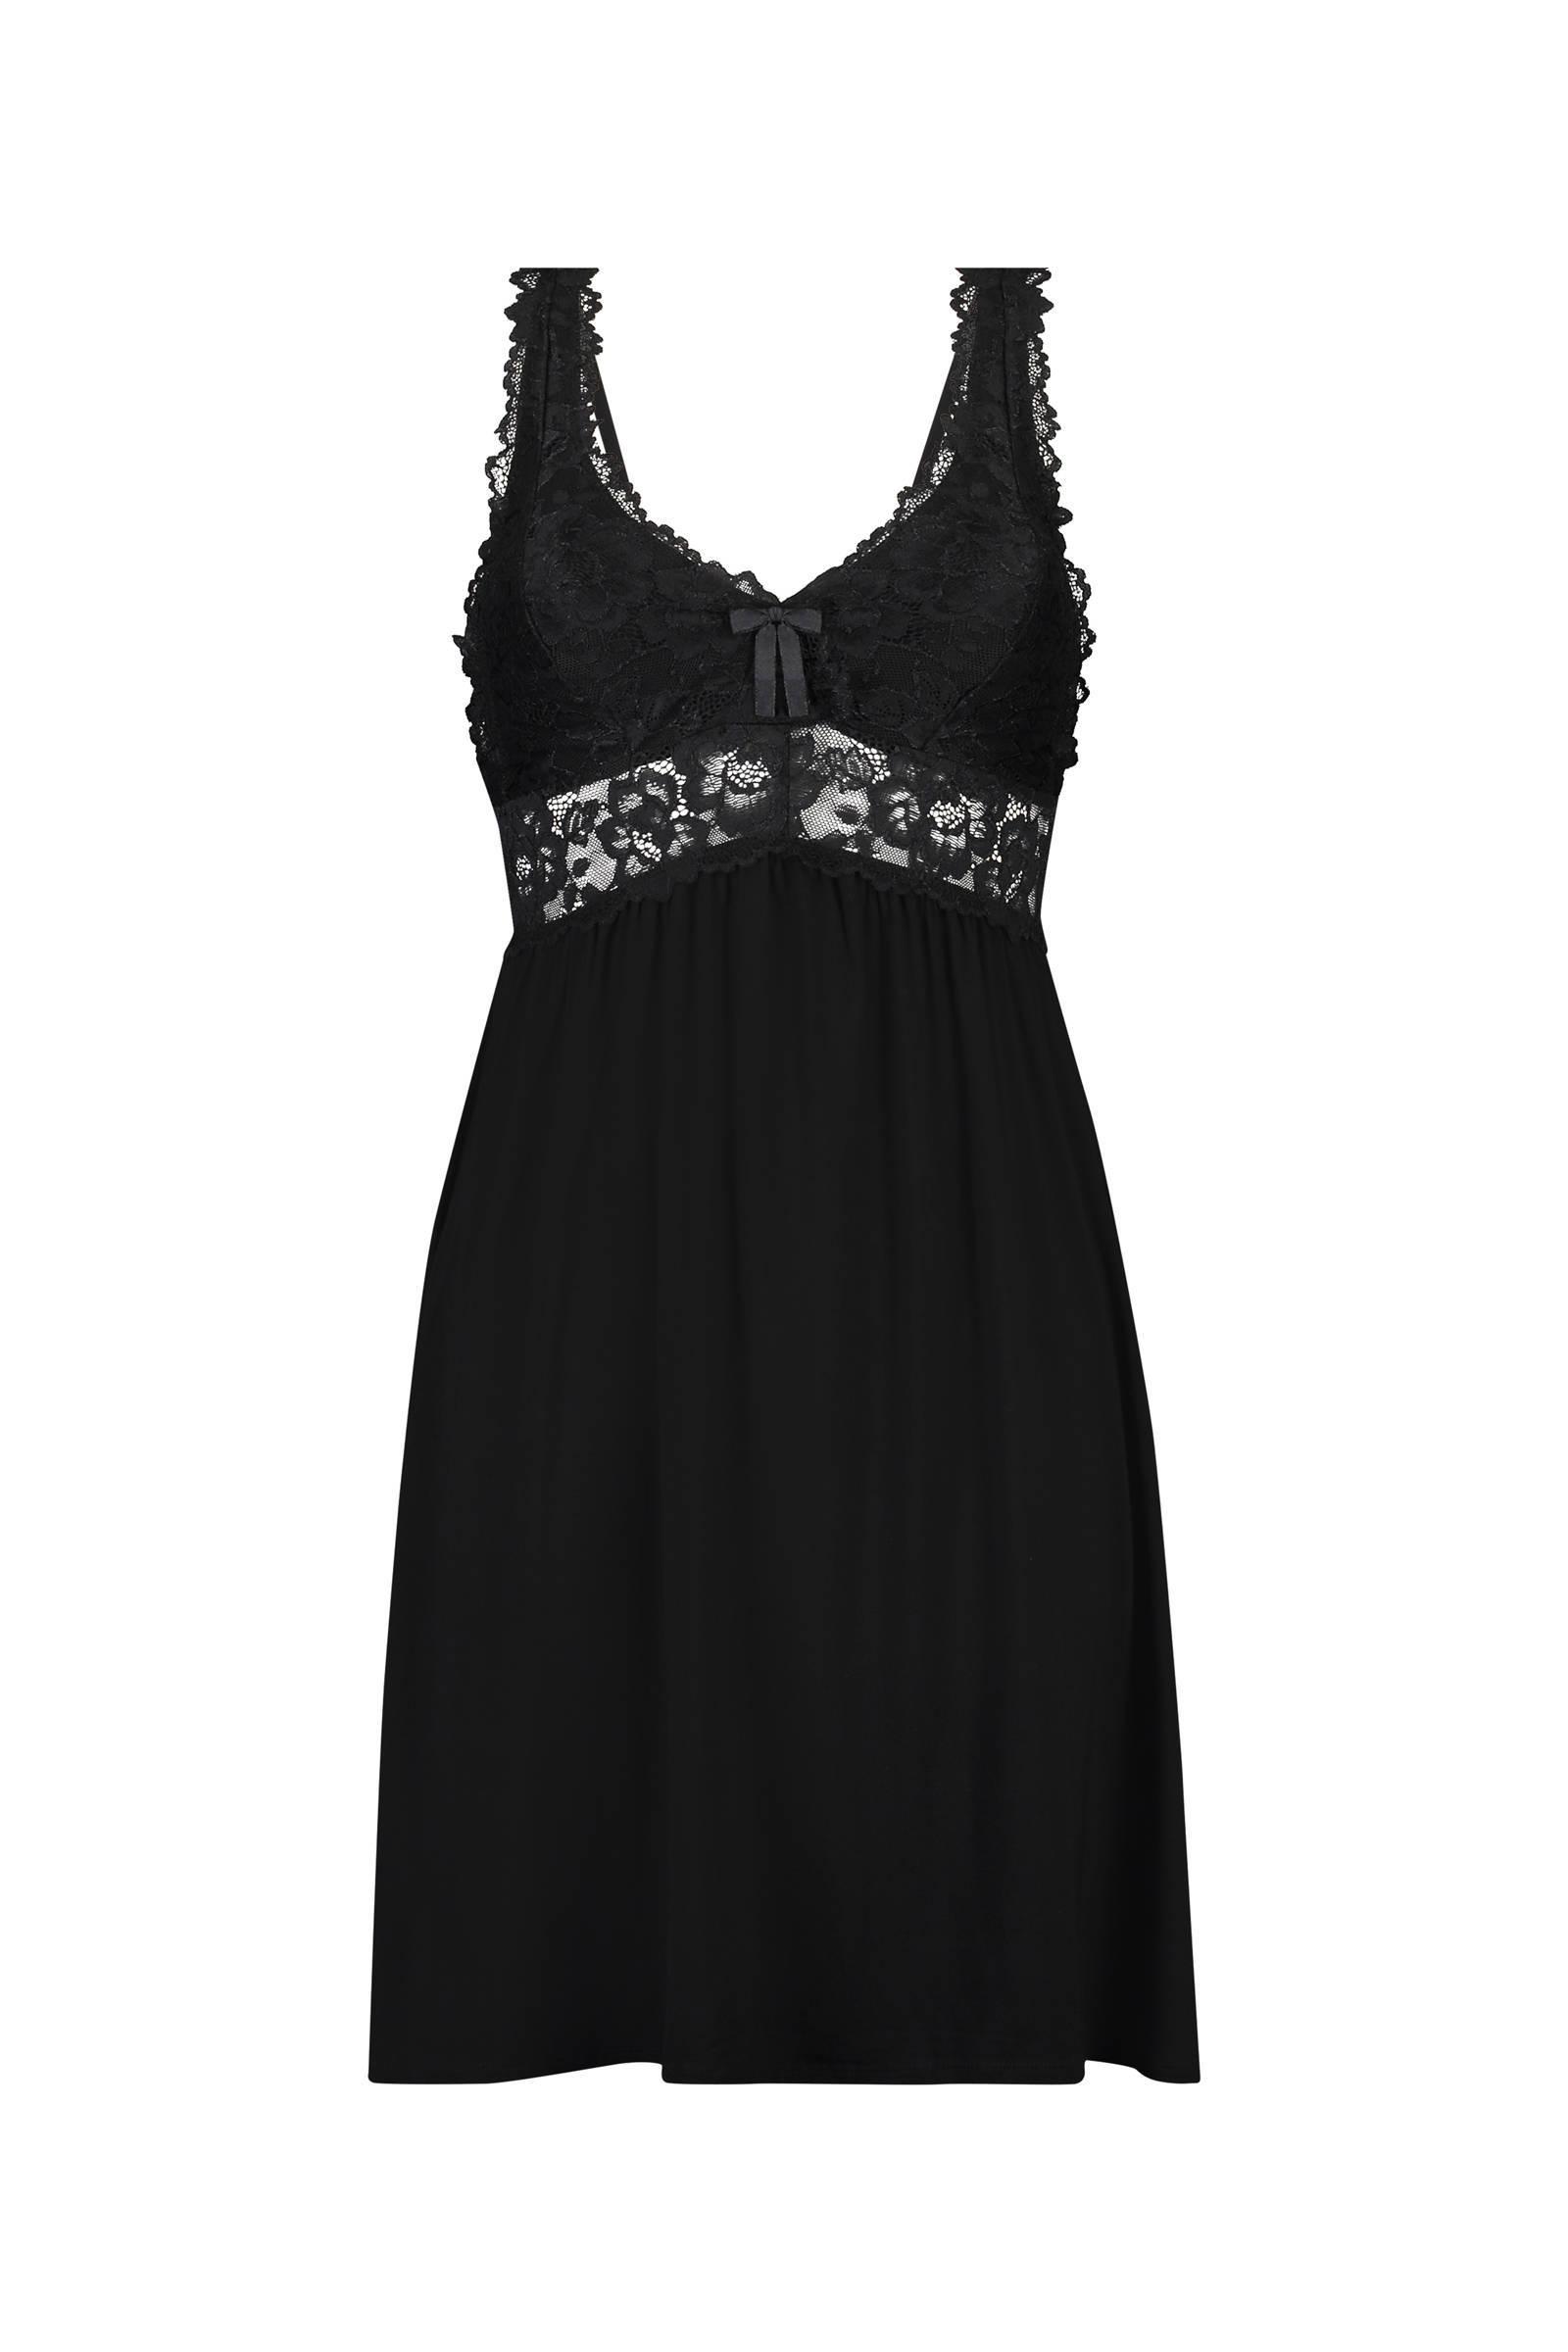 1ccab8e0b4c734 hunkemoller-slipdress-modal-lace-zwart-zwart-8715319143509.jpg